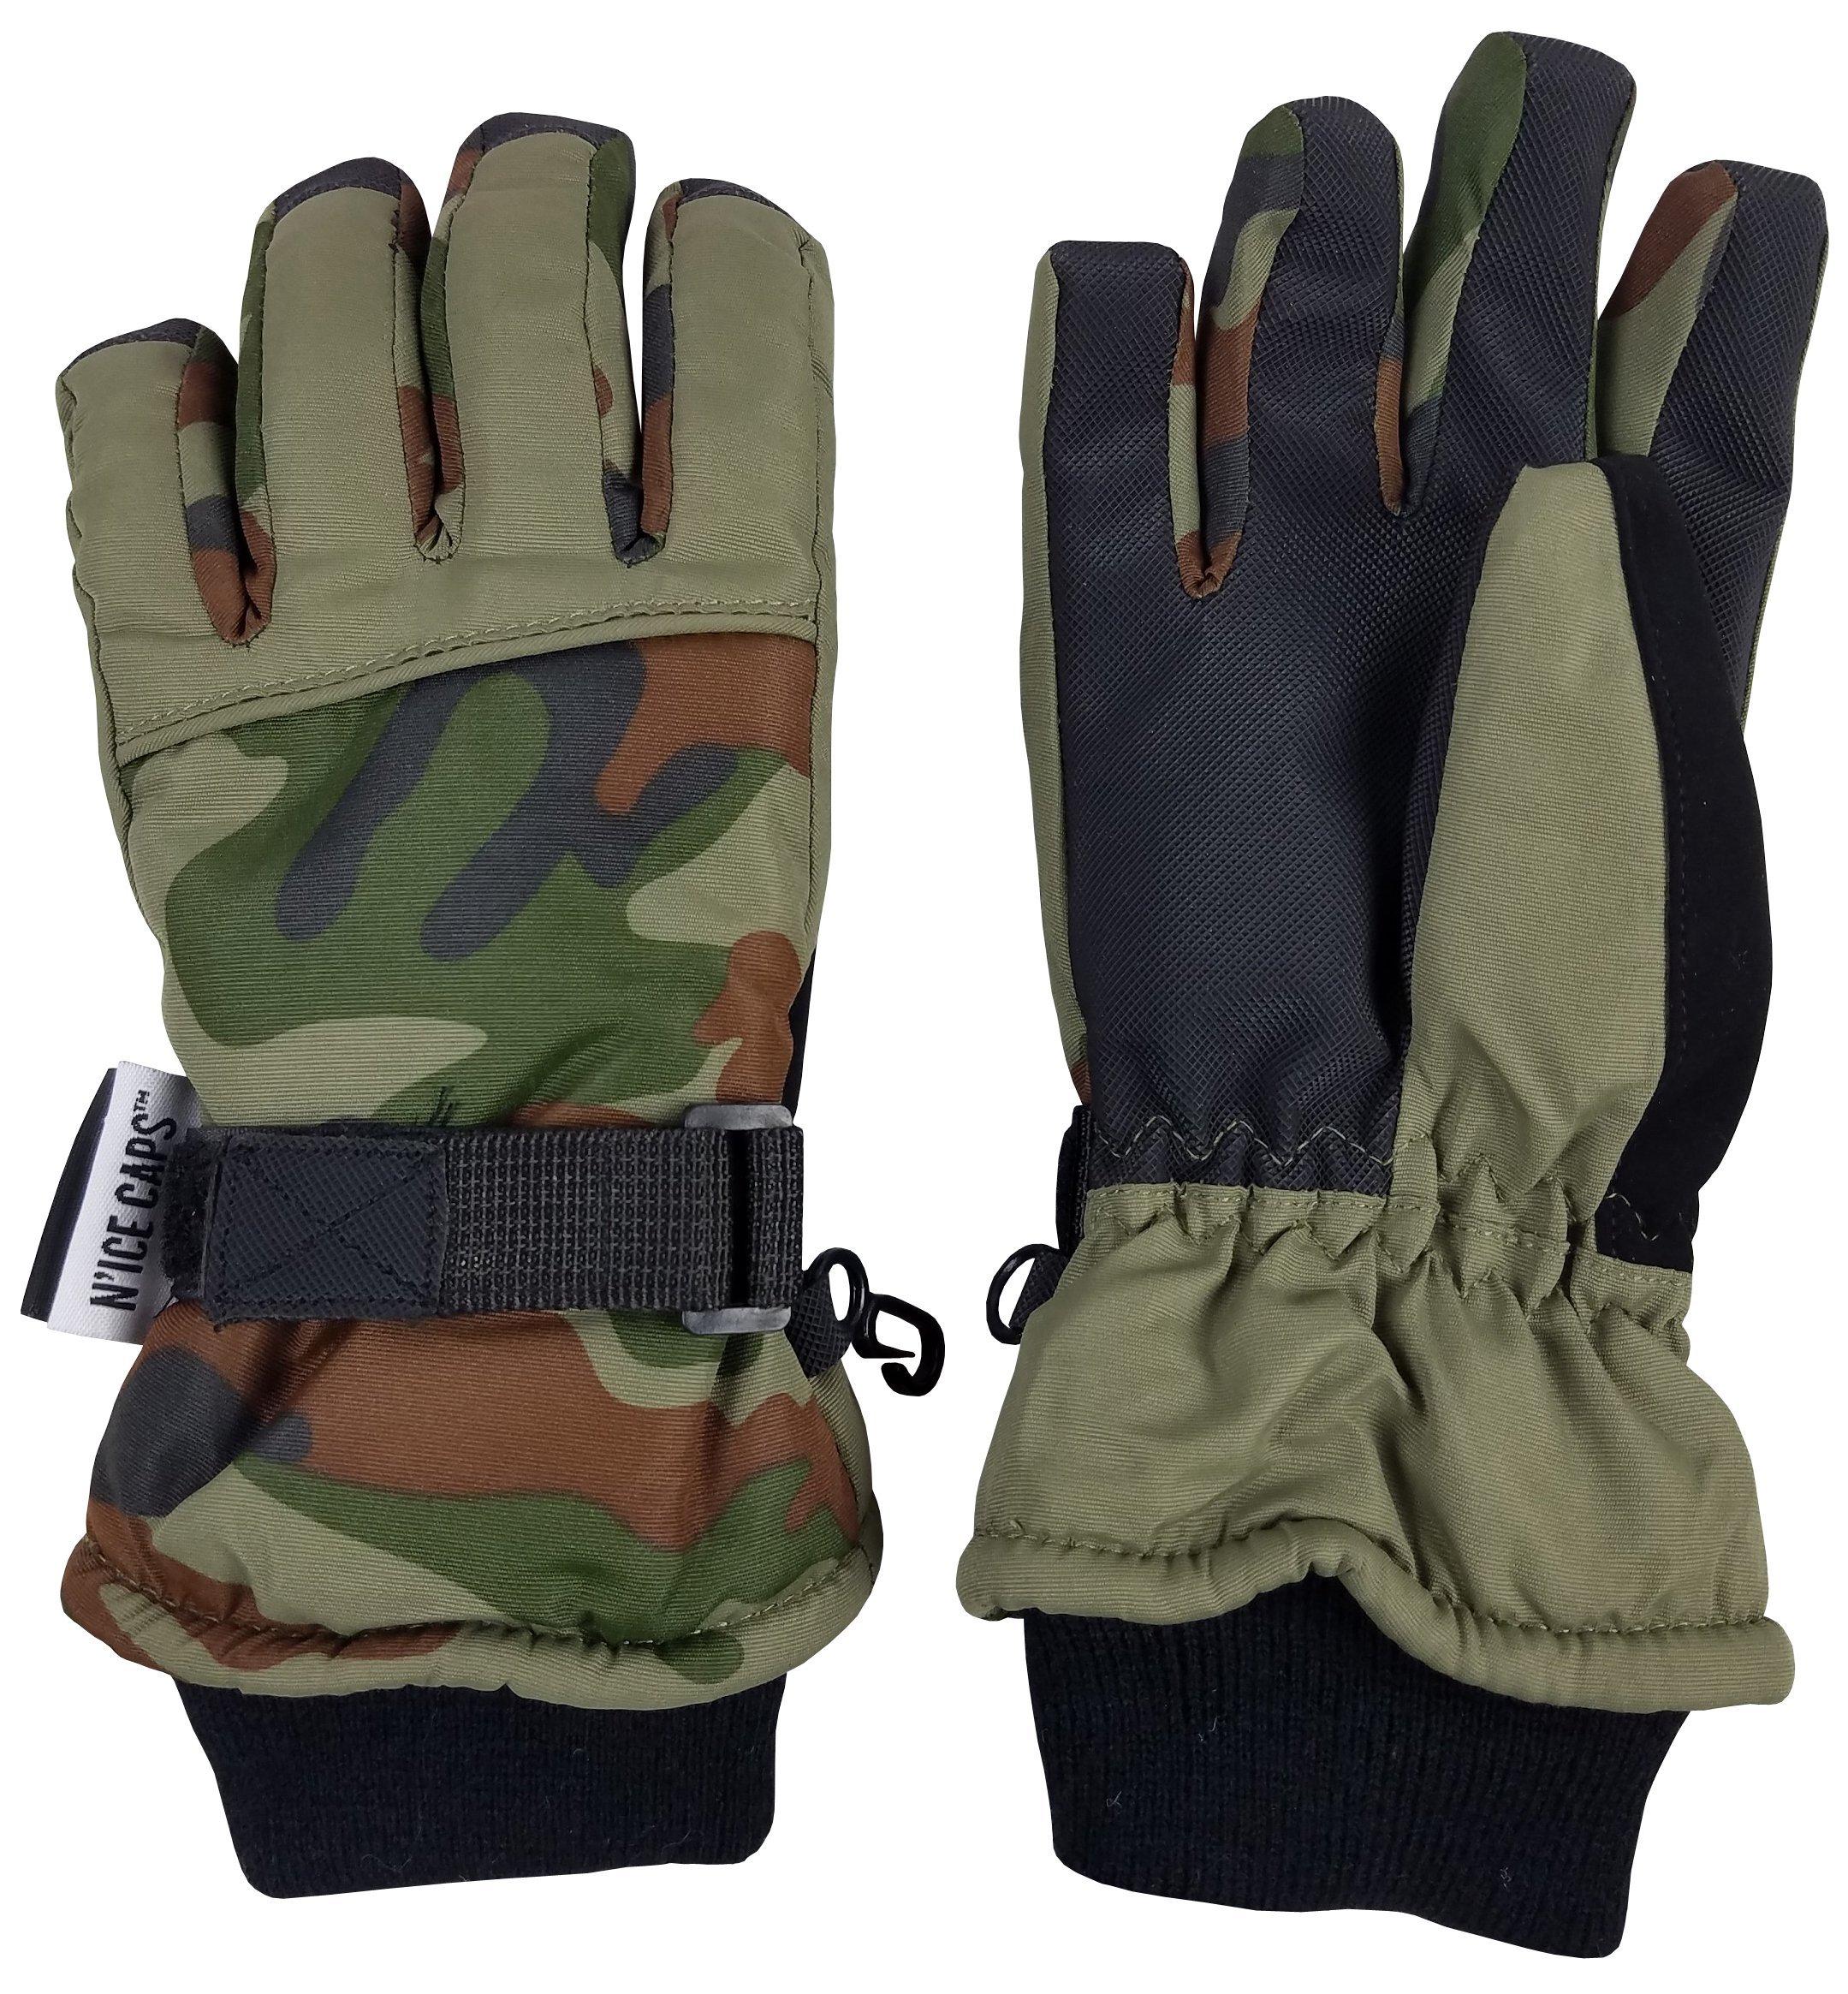 N'Ice Caps Kids Cold Weather Waterproof Camo Print Thinsulate Ski Gloves (10-12 Years, Green Camo/Black)